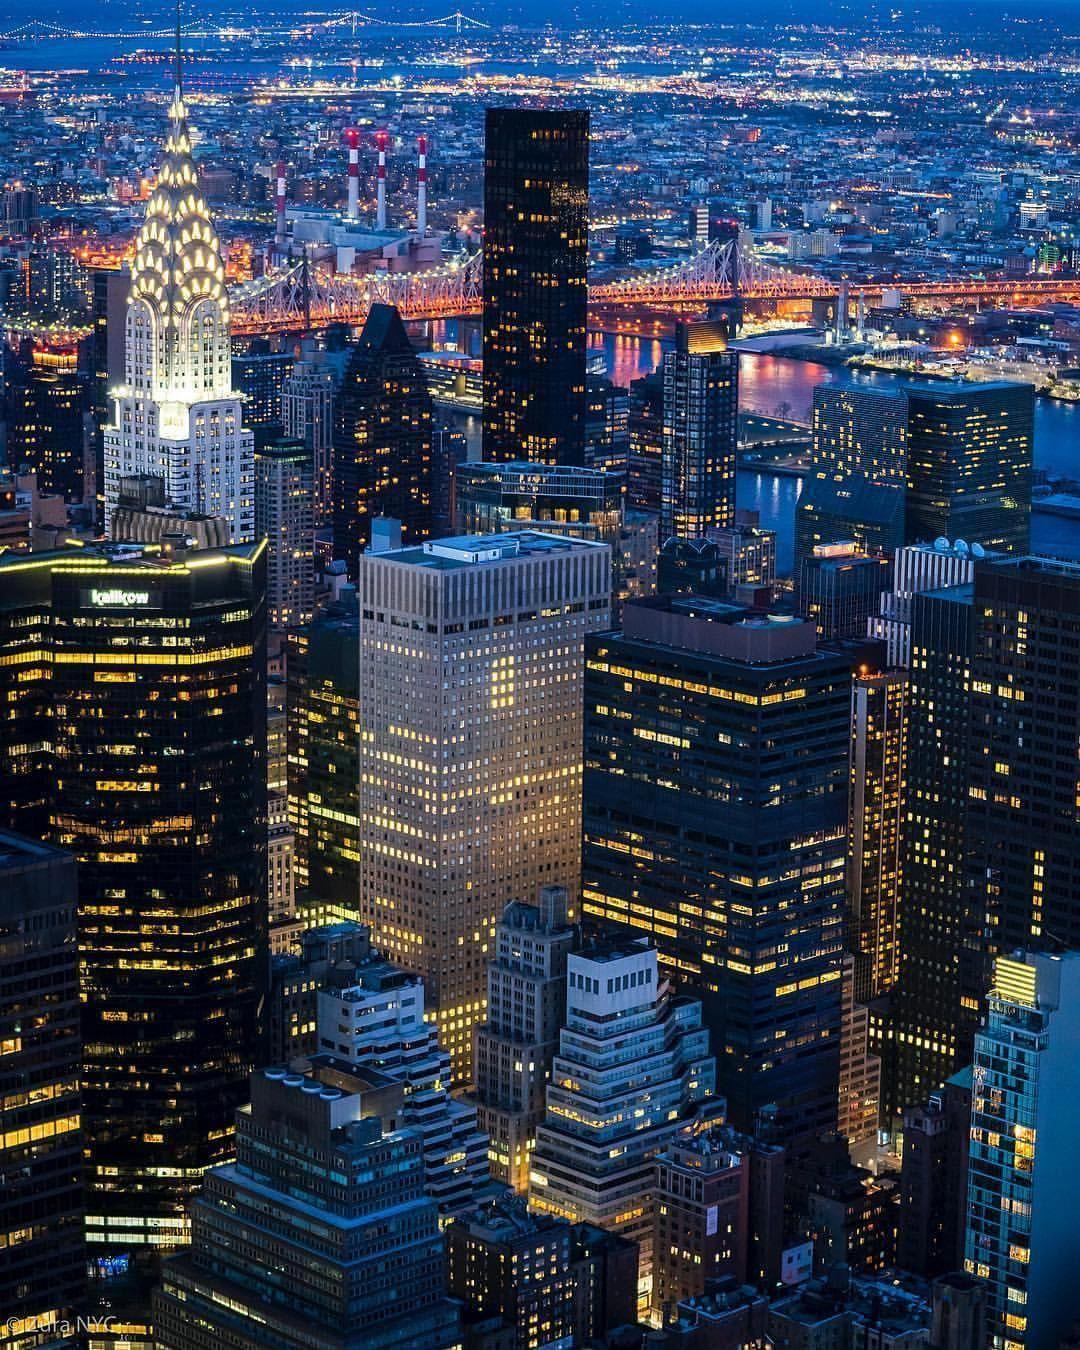 Pin by seddik on Night Photography in 2020 New york city